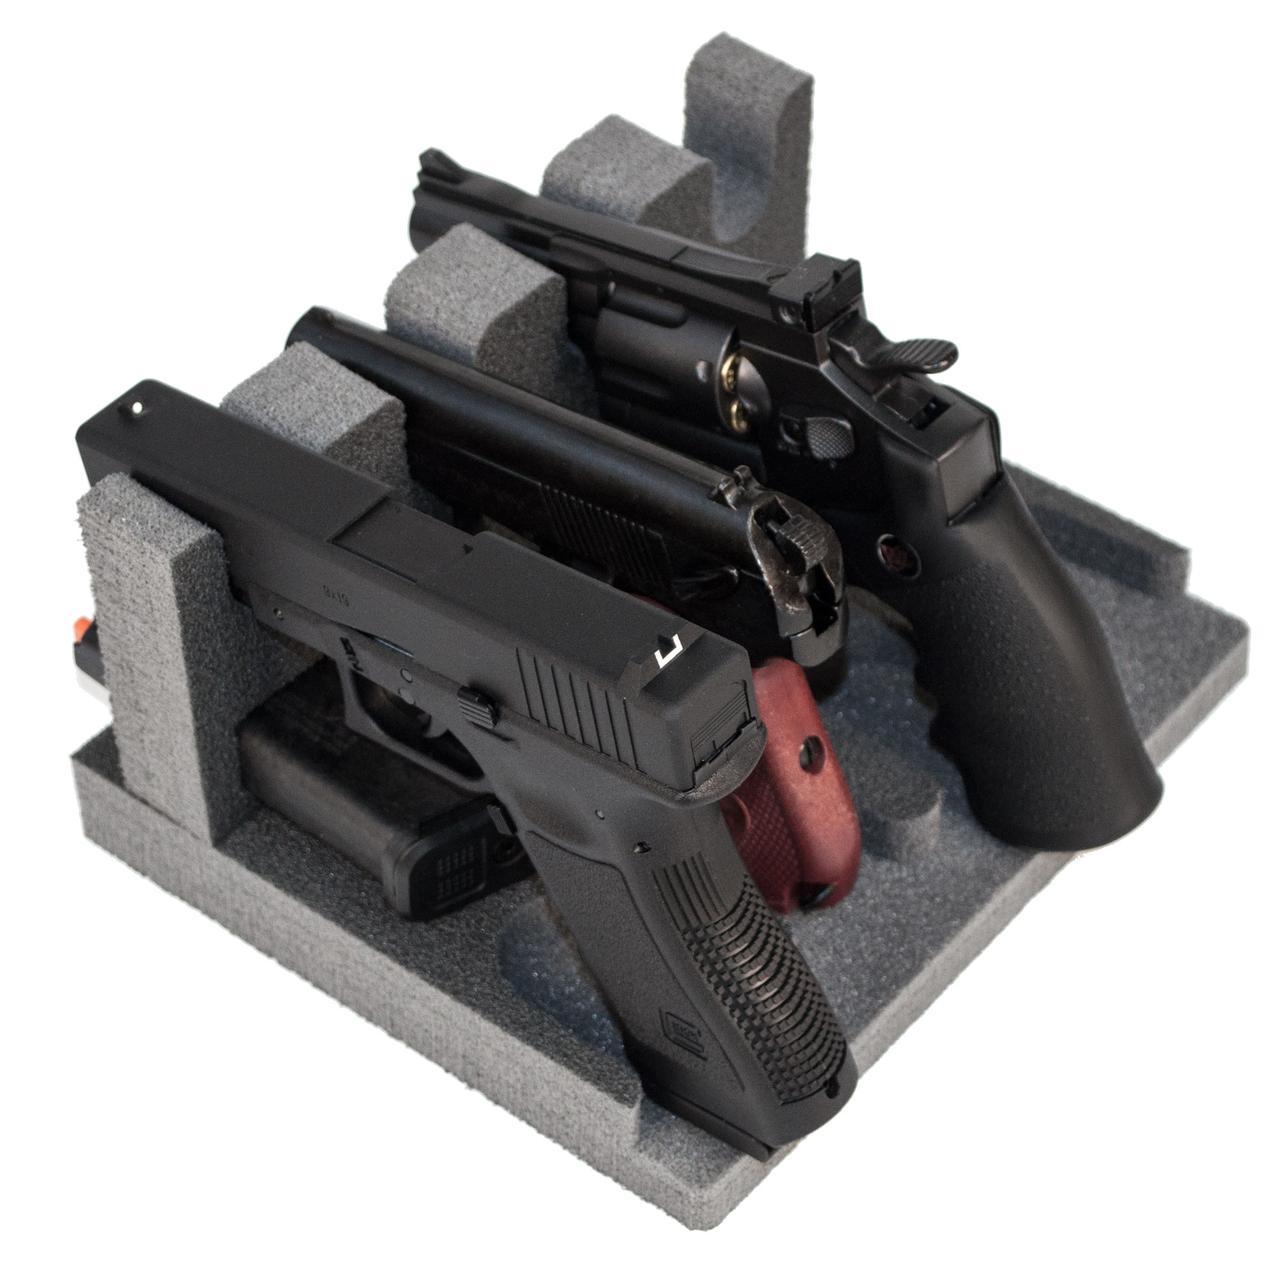 Ложемент/Подставка для пистолетов GR4 на 4 пистолета и на 4 магазина